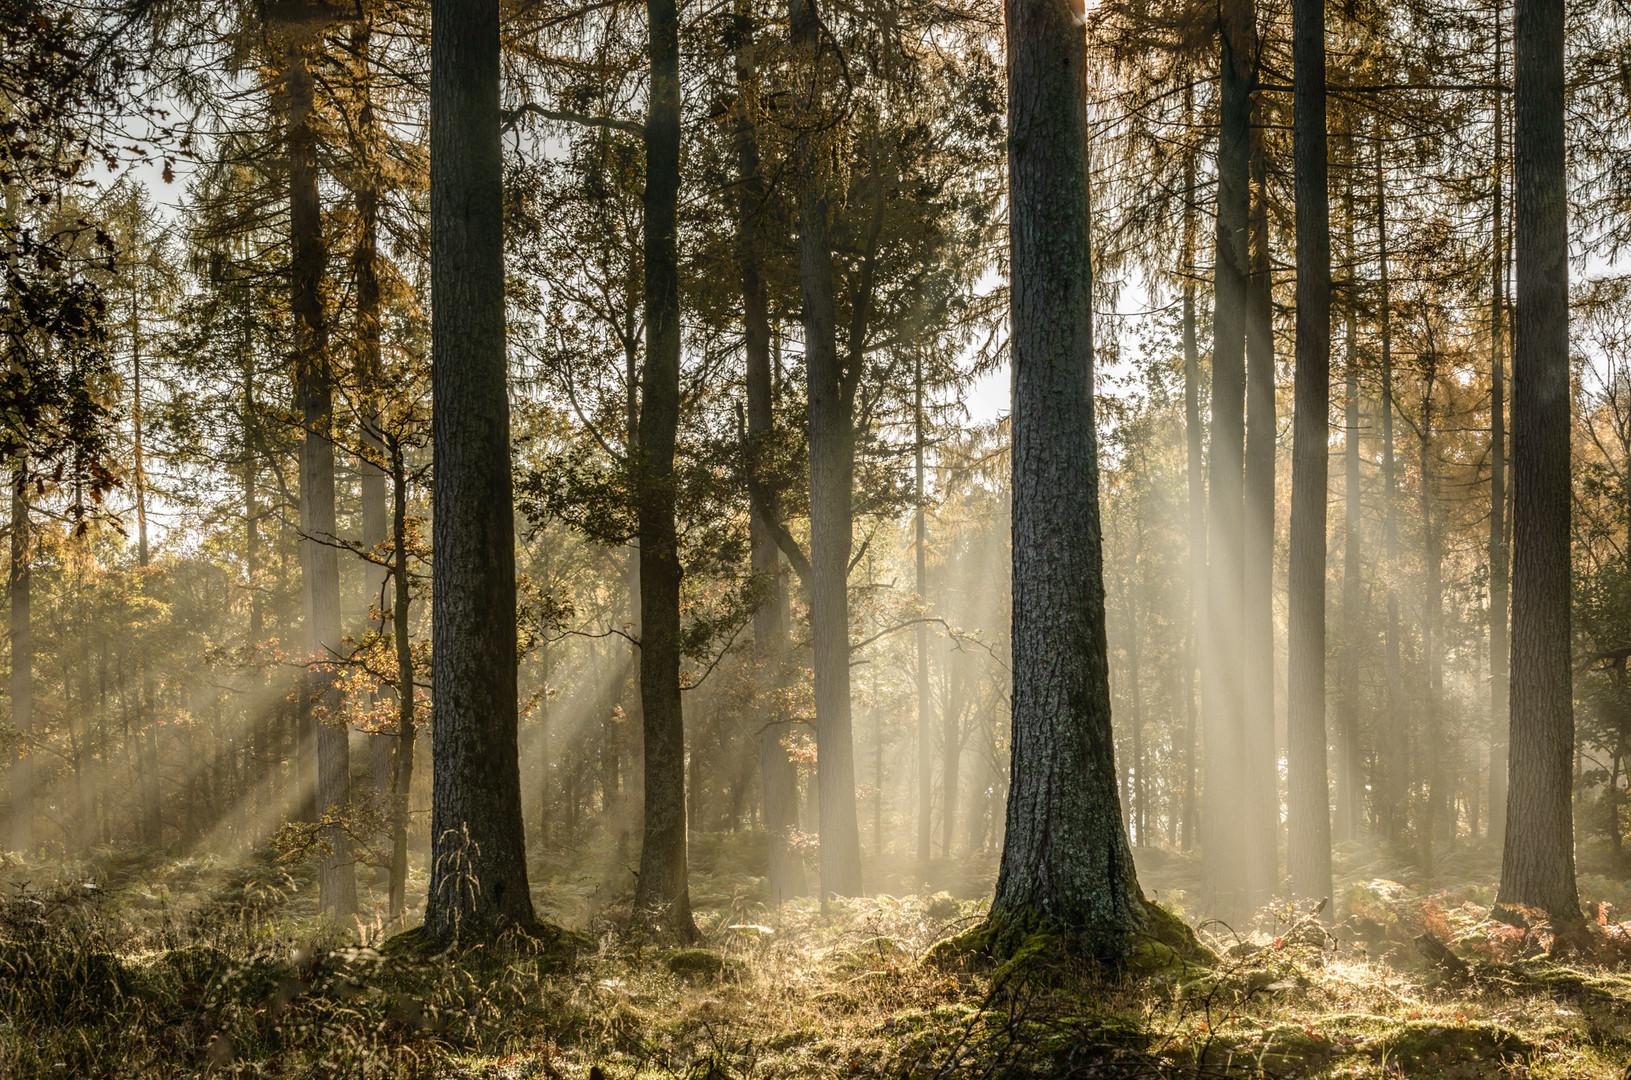 Crepuscular rays Manesty woods